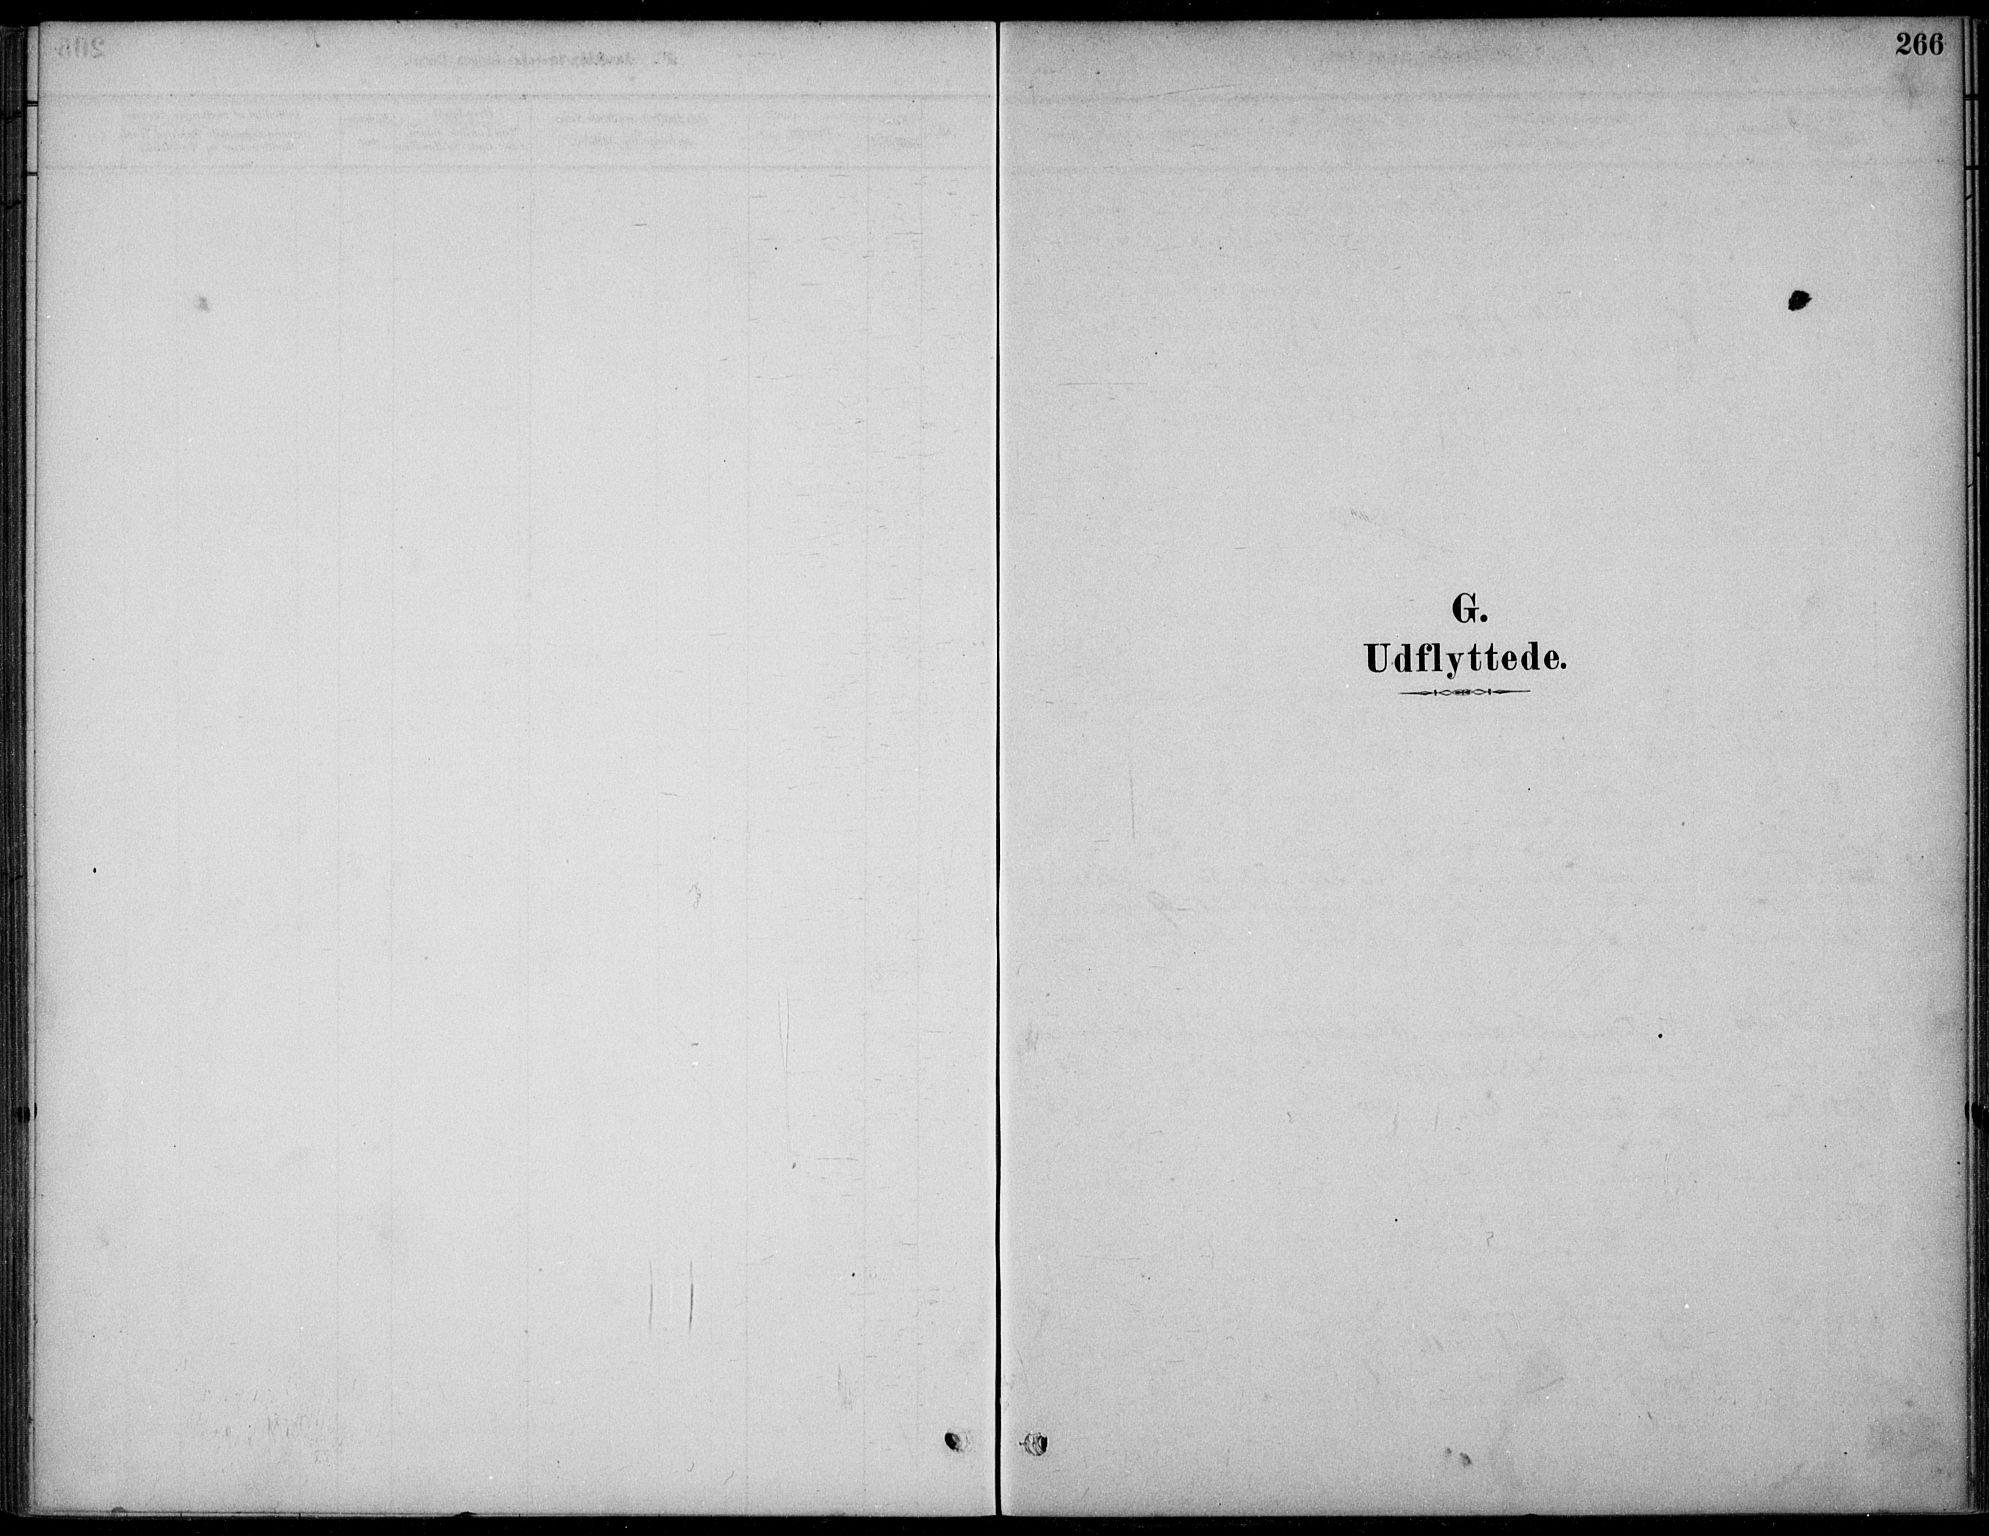 SAKO, Hjartdal kirkebøker, F/Fc/L0002: Ministerialbok nr. III 2, 1880-1936, s. 266